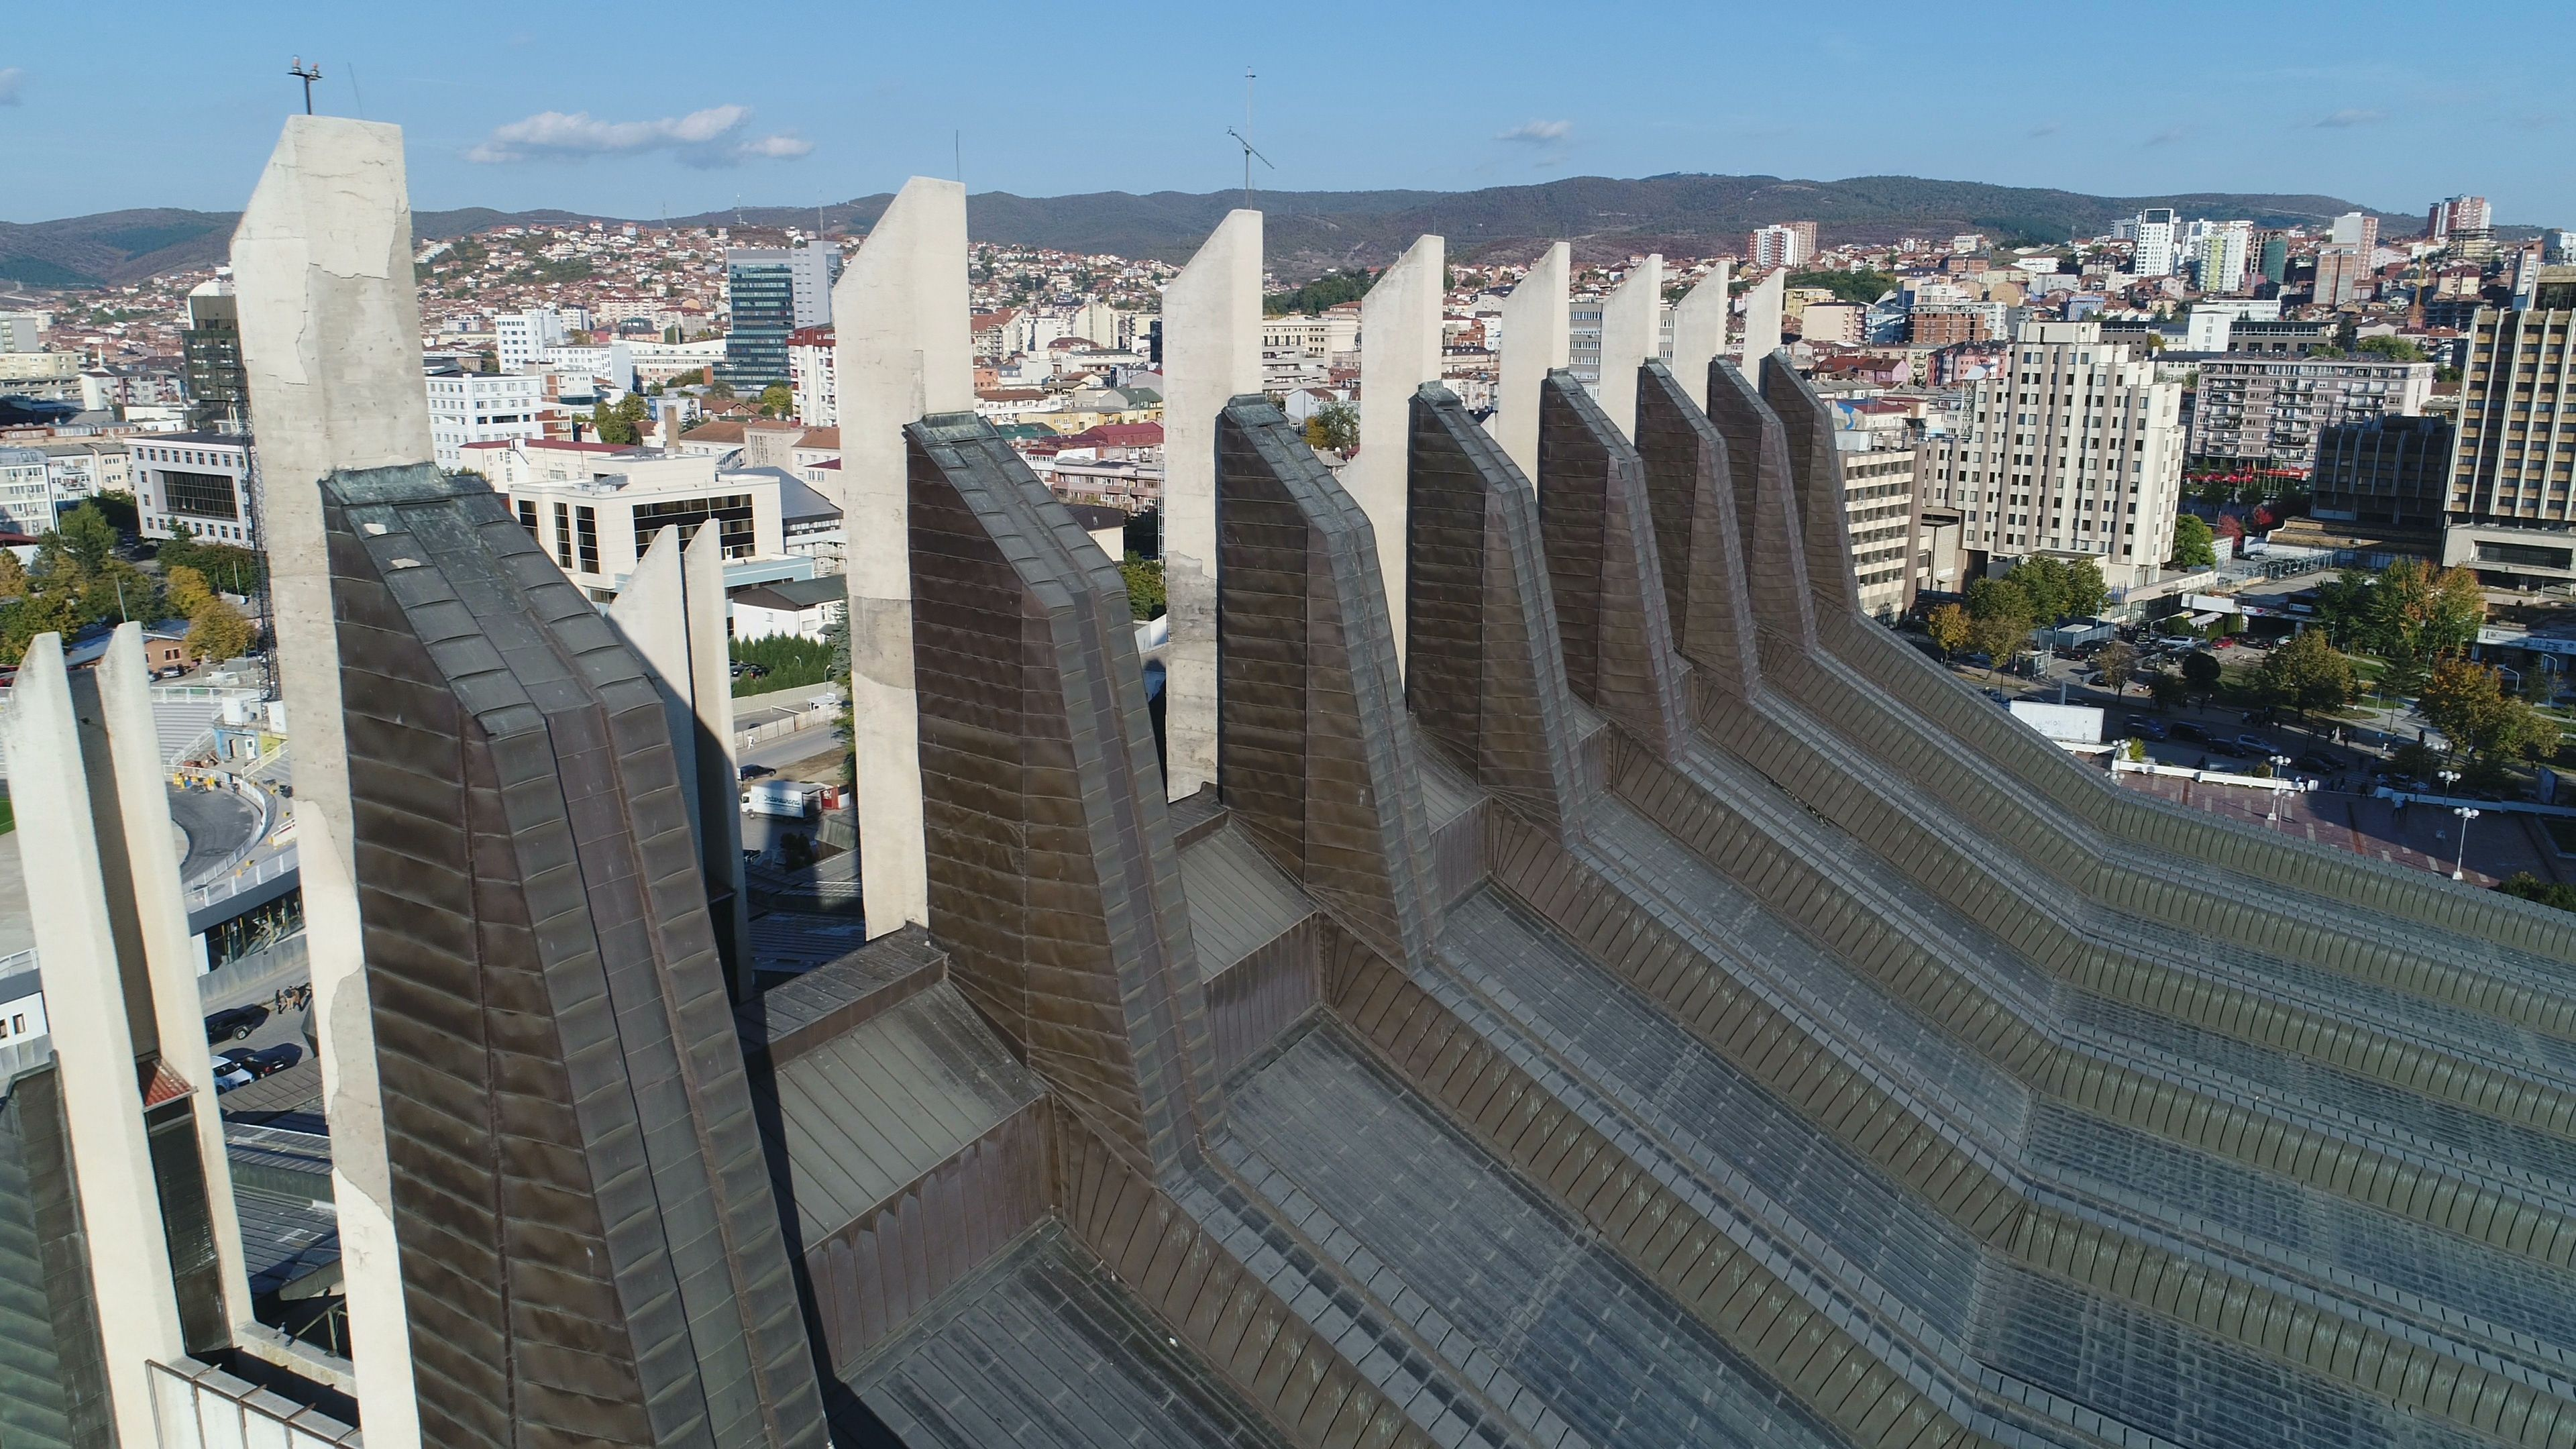 Drone shot sports center Pristina, Soviet era architecture